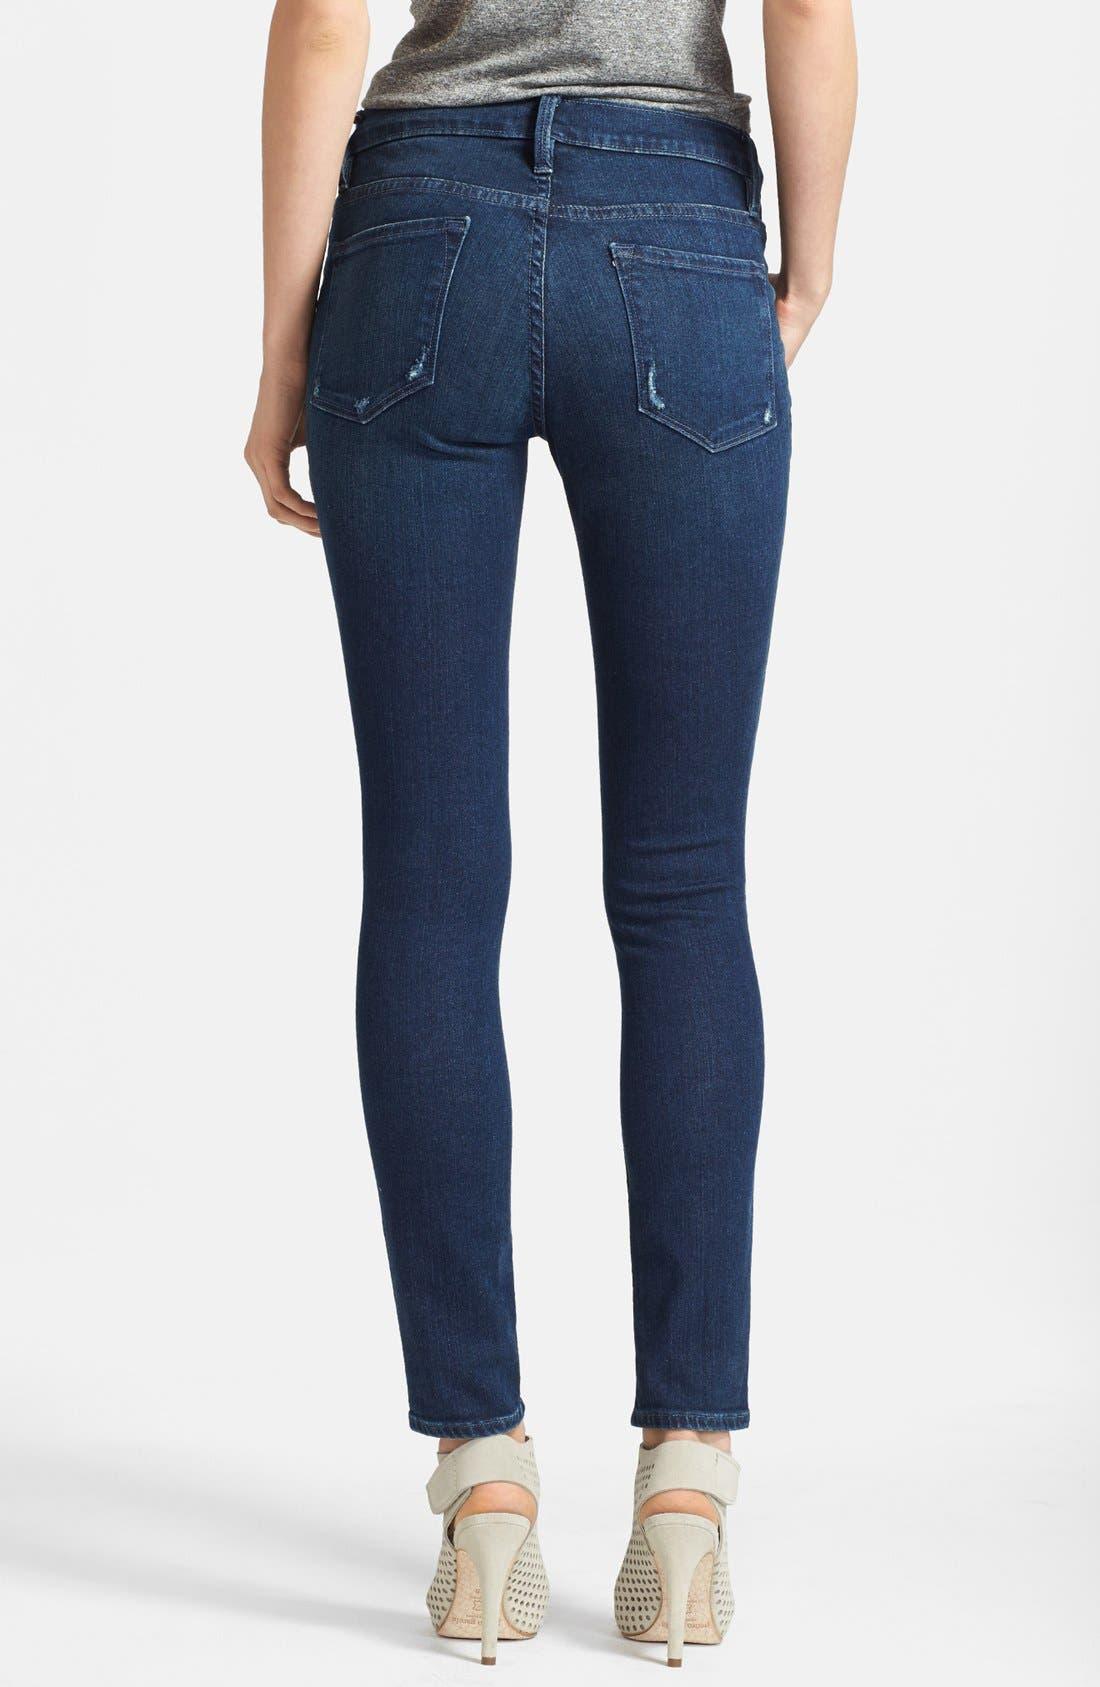 Alternate Image 2  - Frame Denim 'Le Skinny de Jeanne' Jeans (Runyon Canyon)